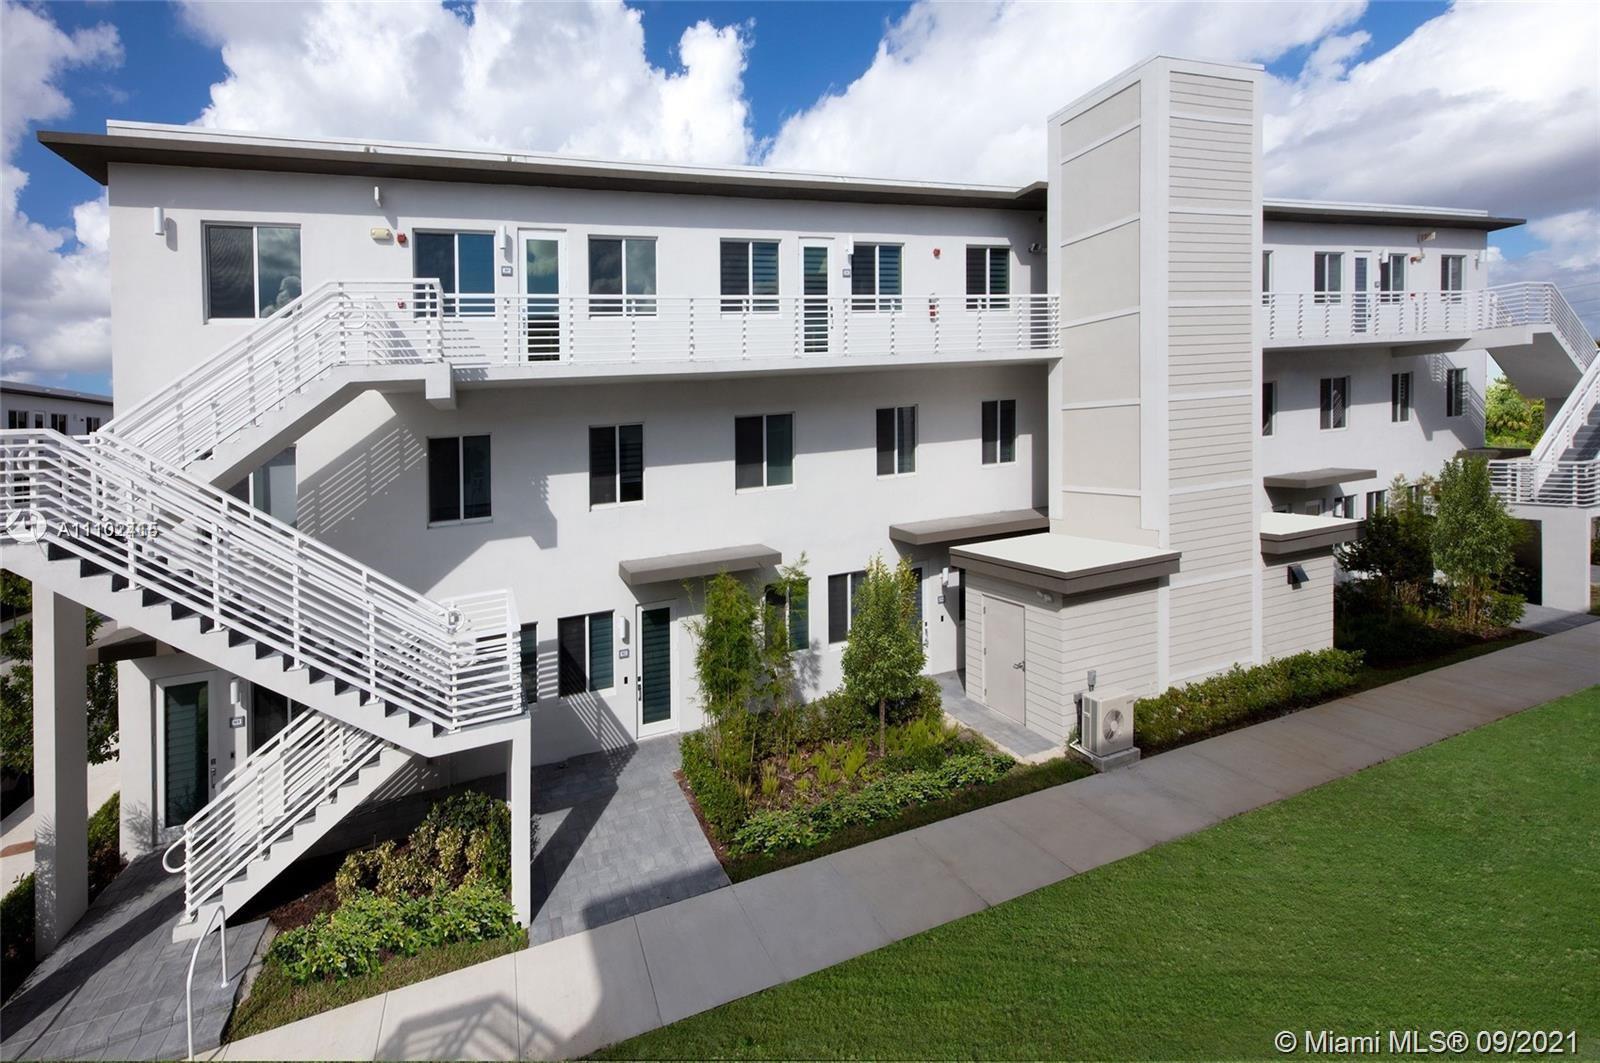 Landmark At Doral Condo,For Rent,Landmark At Doral Brickell,realty,broker,condos near me